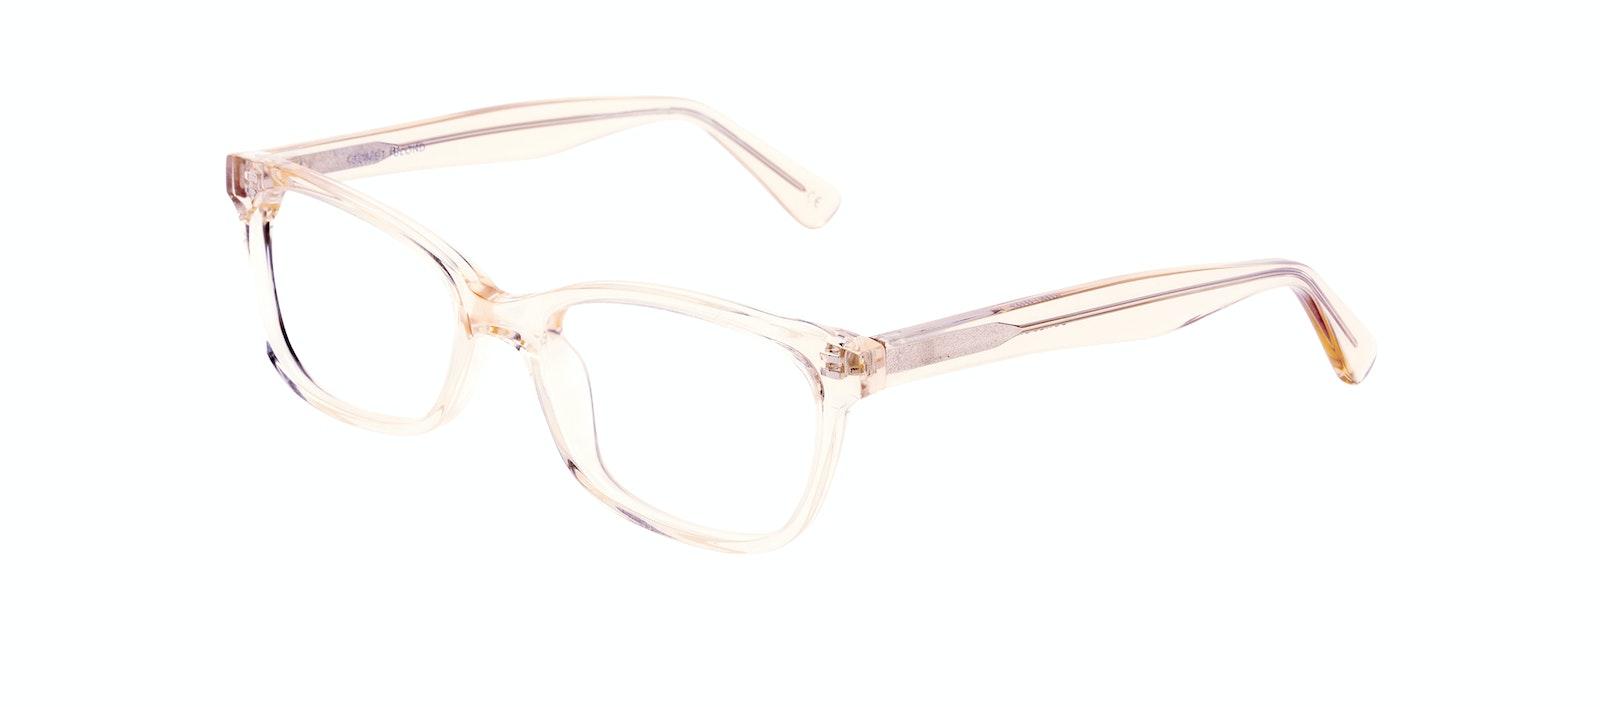 Affordable Fashion Glasses Cat Eye Rectangle Square Eyeglasses Women Comet Blond Tilt